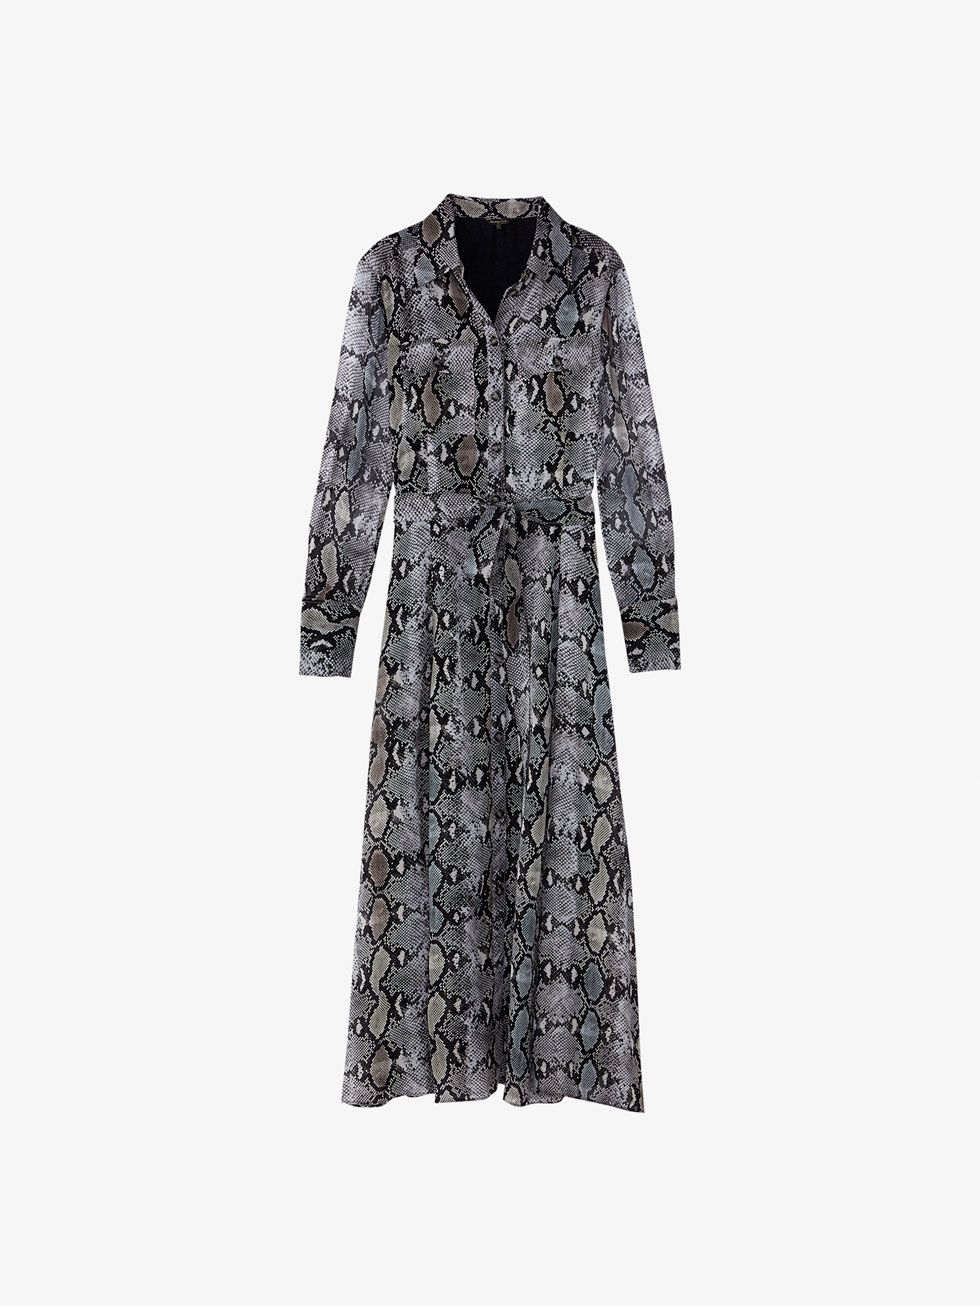 d330ac3a5e Snakeskin print dress with tie belt | Massimo Dutti | Dresses, Belt ...